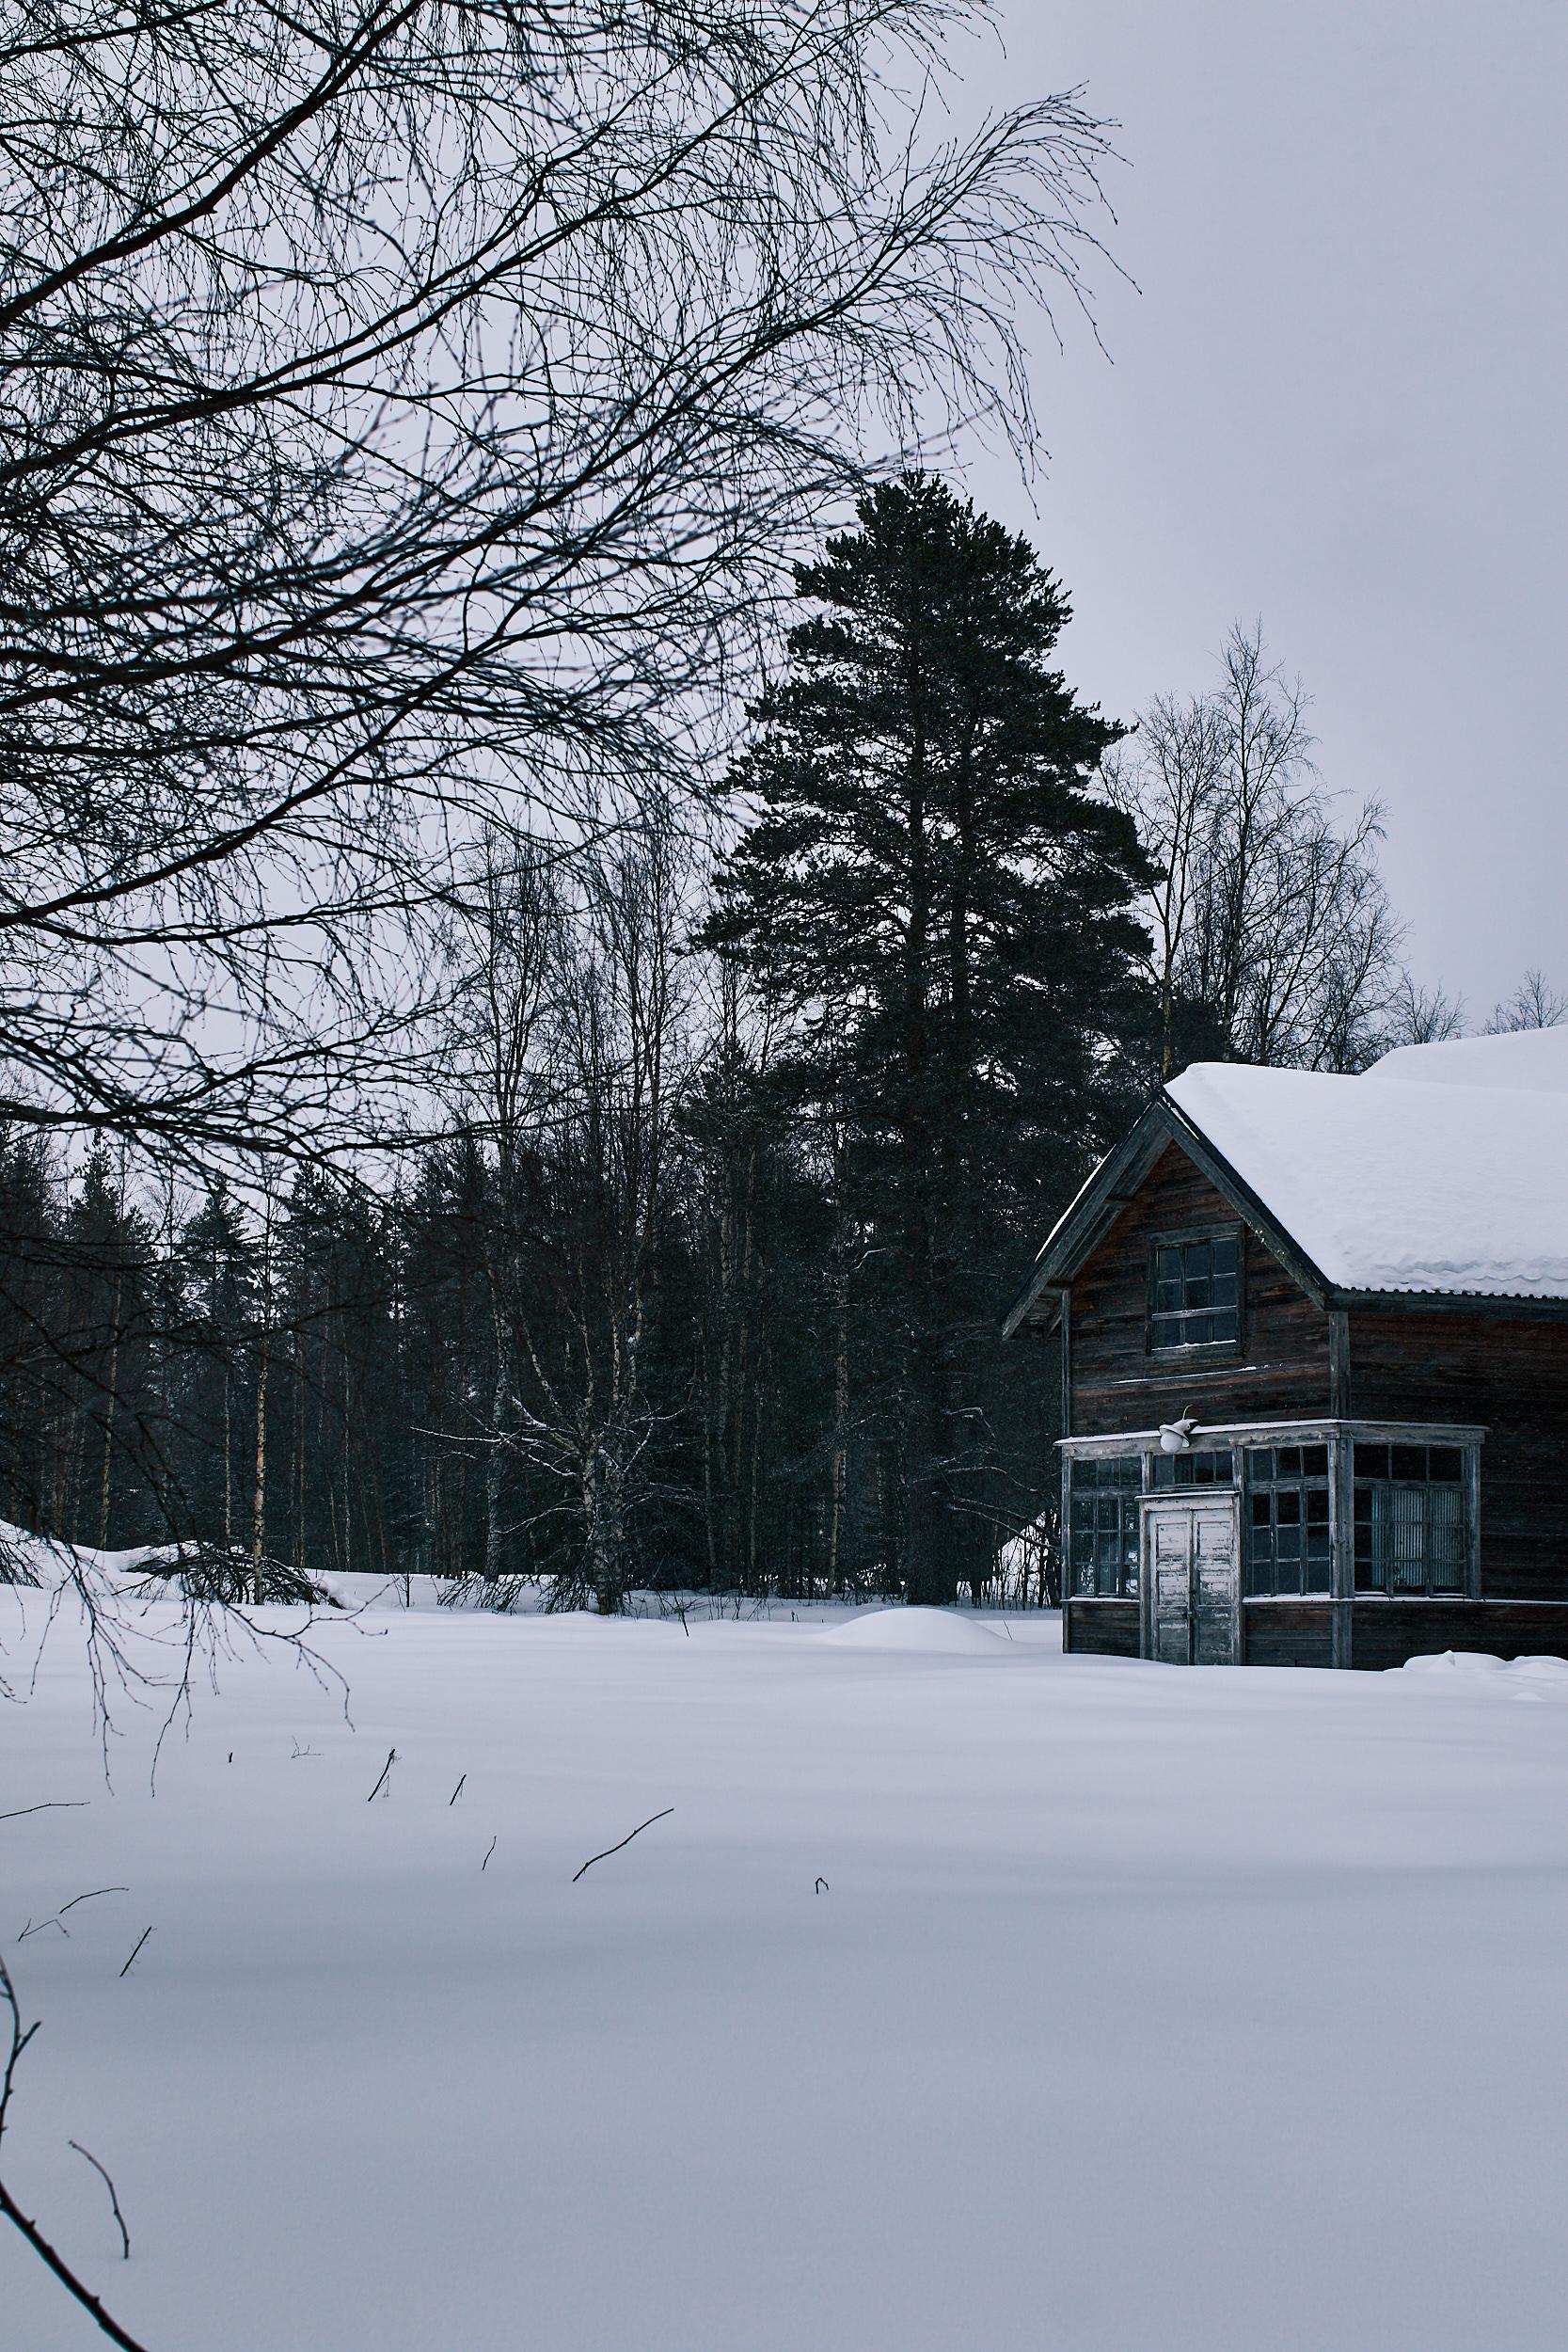 35 mm - 2019-03-08 12.05.25 - Oulu Marvin Timo.jpg